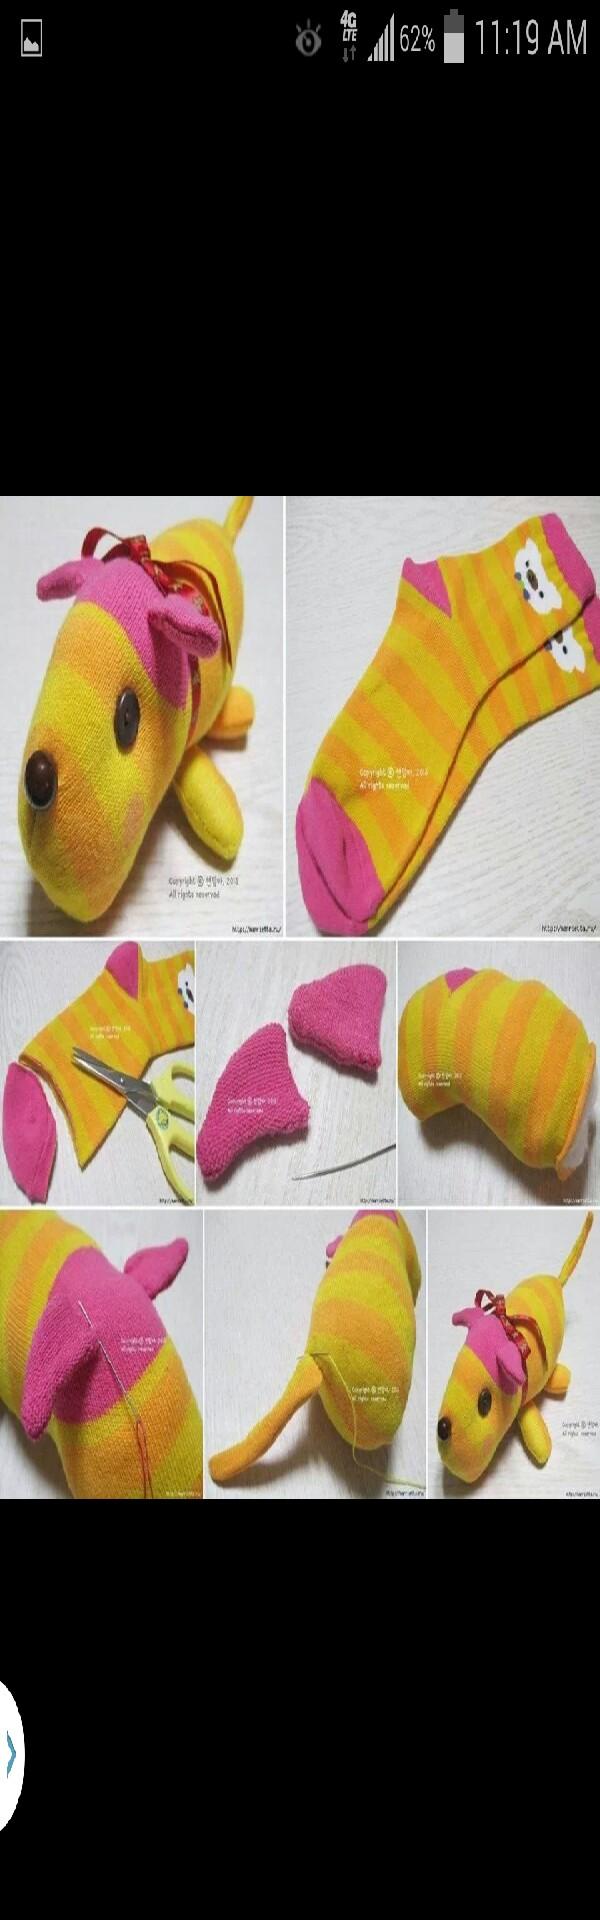 How to make plush toys using socks.